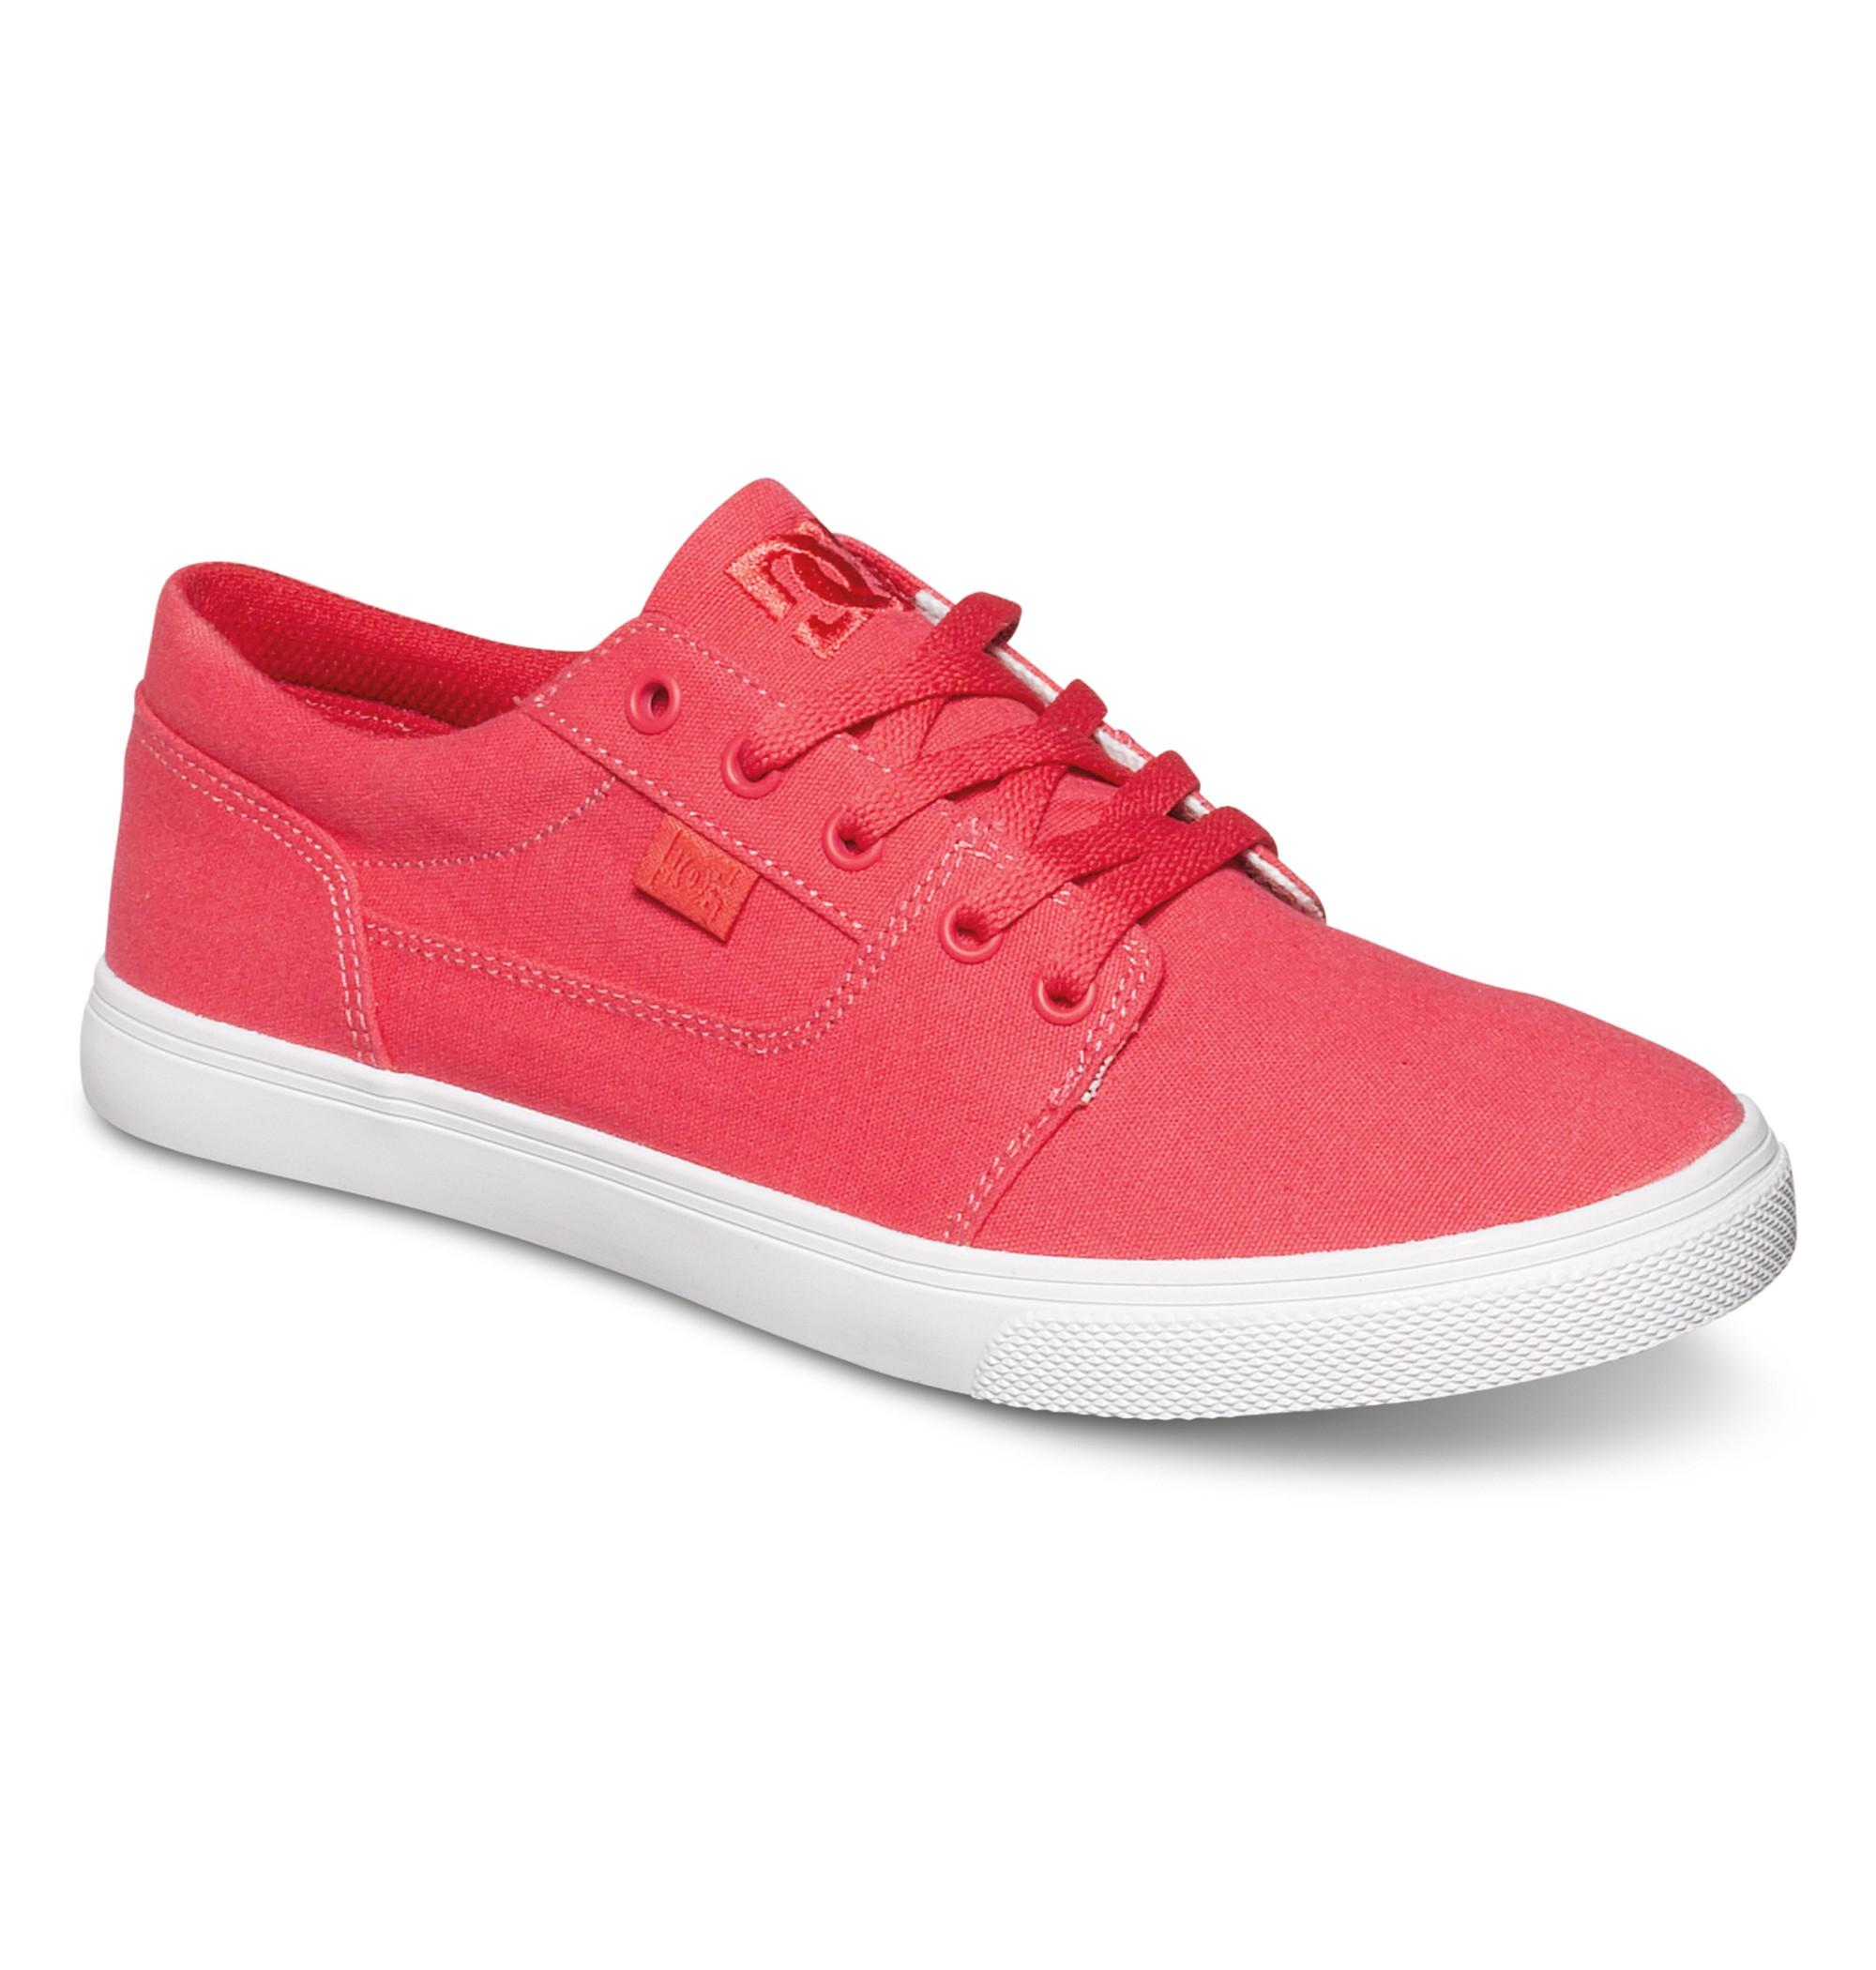 Tenisky DC Tonik W Tx pink